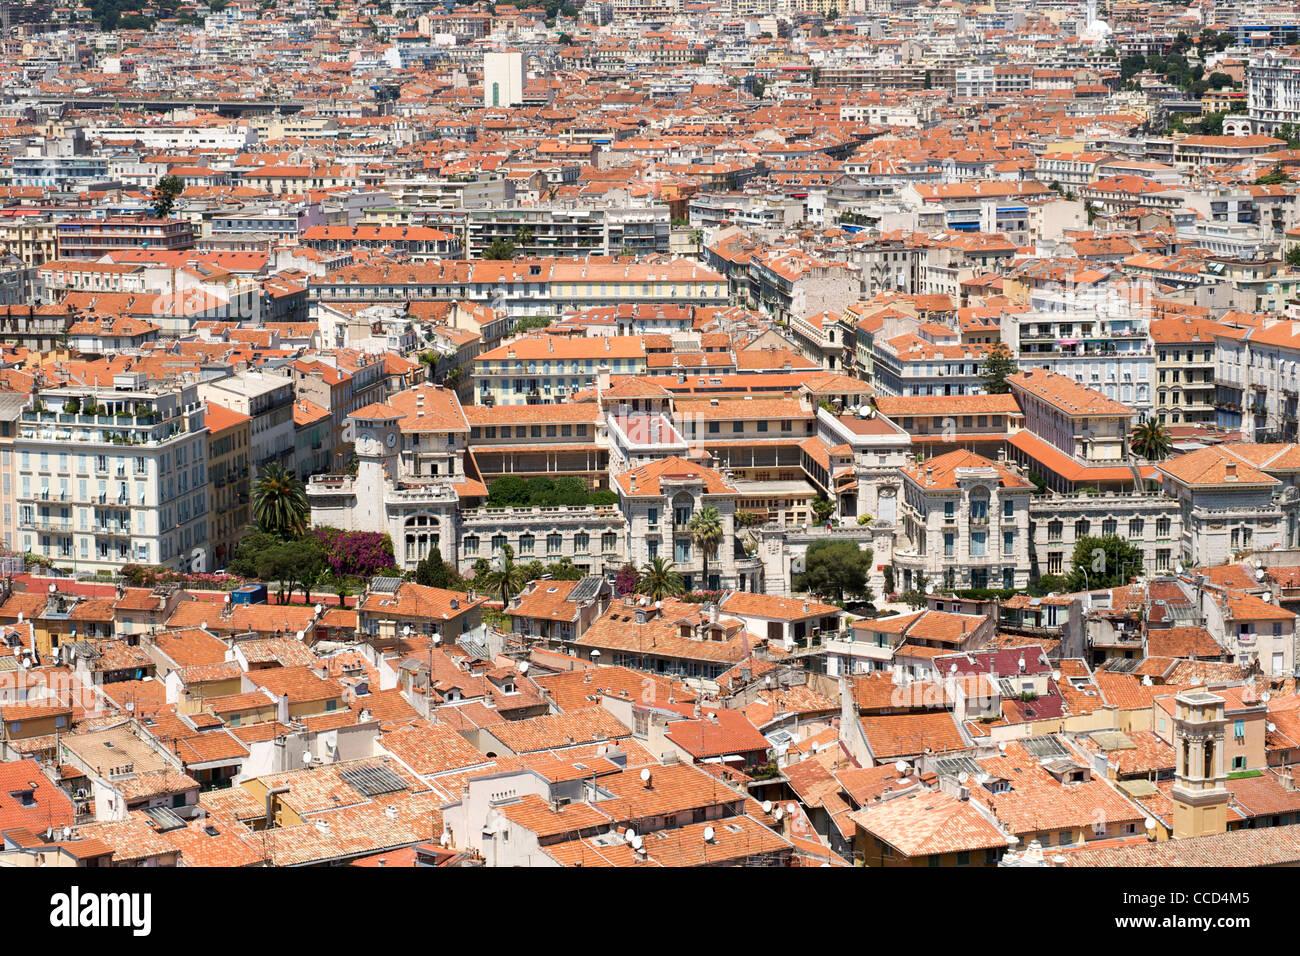 Nice Old Town Stock Photos  U0026 Nice Old Town Stock Images